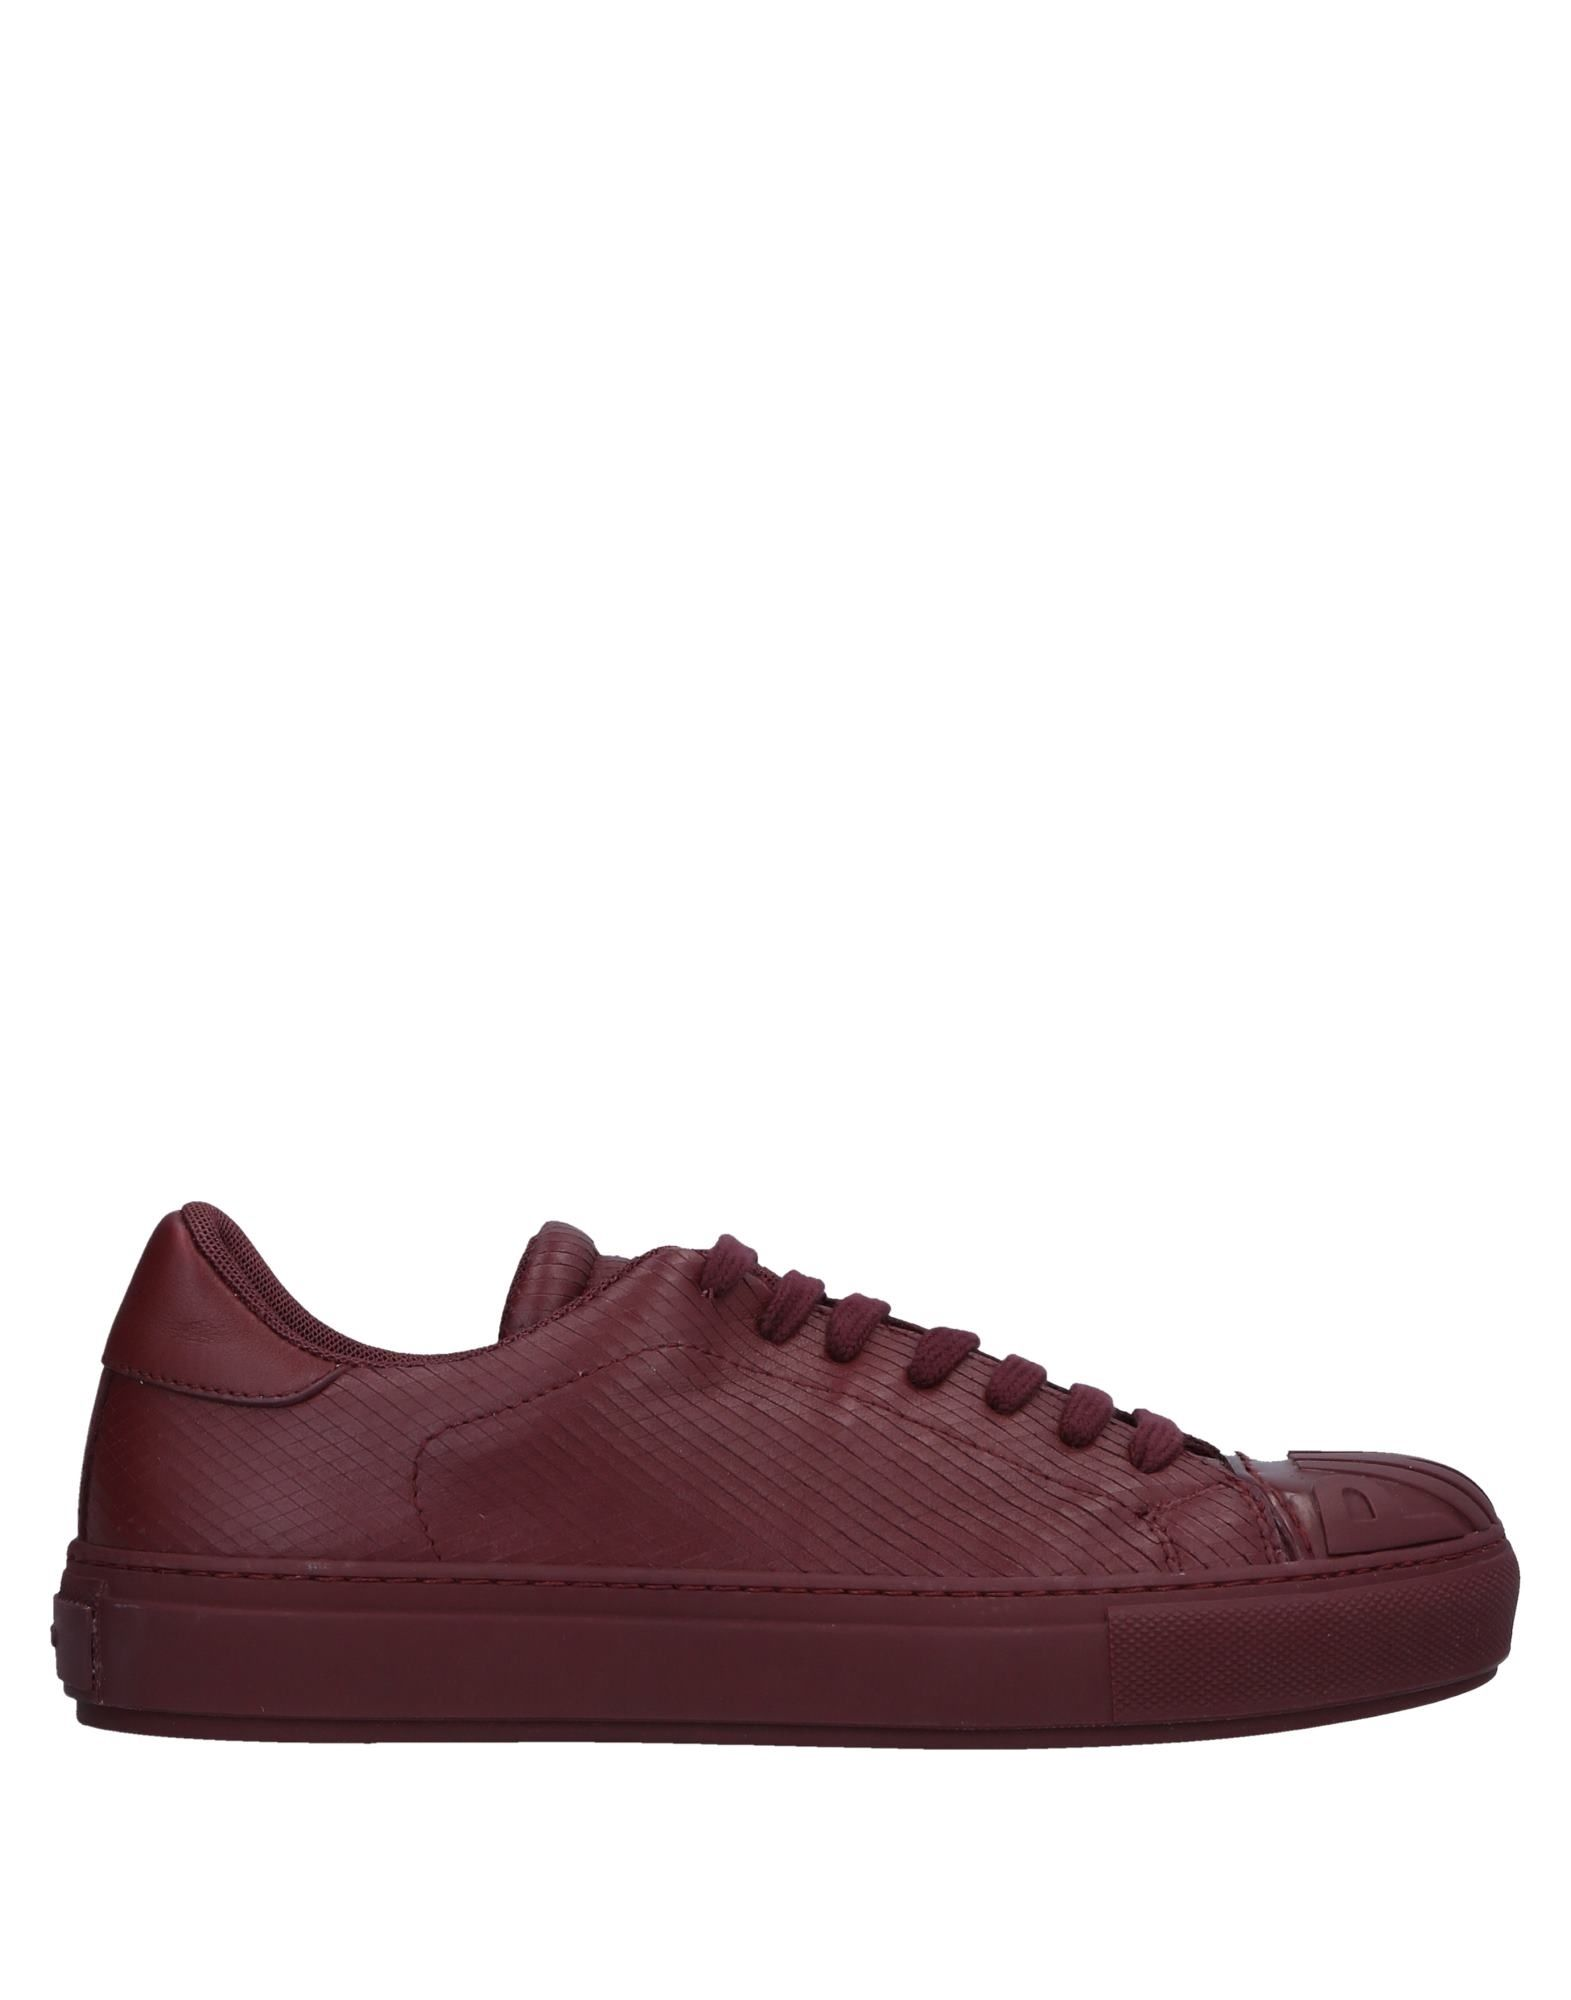 Moda Sneakers Pinko Donna - 11520280DO